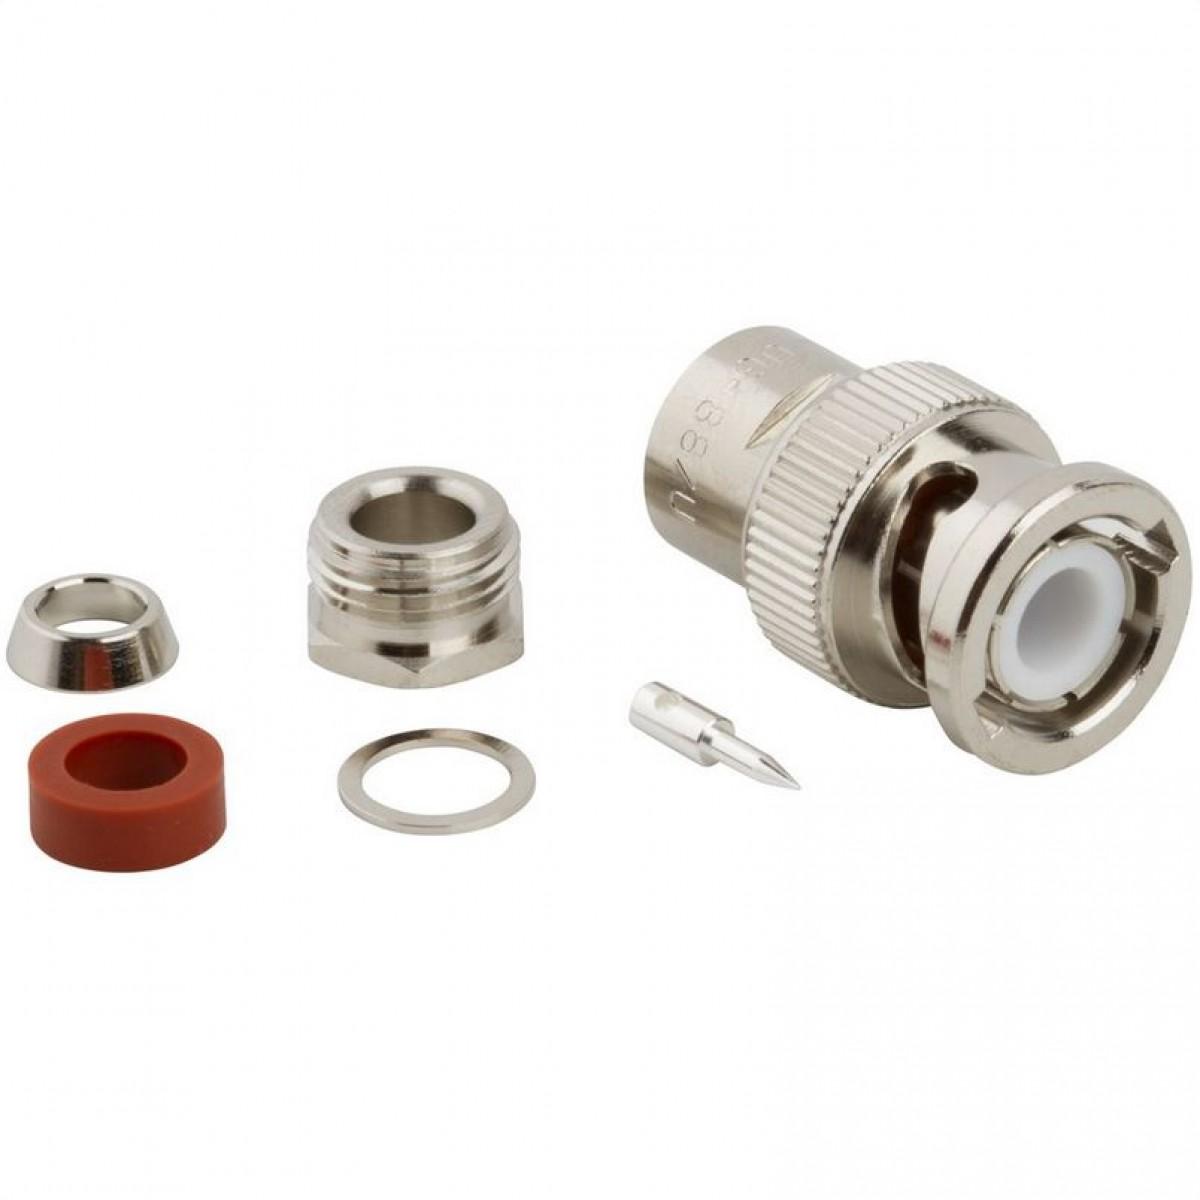 Aphenol BNC-Kabelstecker UG88/U | Elektronik für jedermann